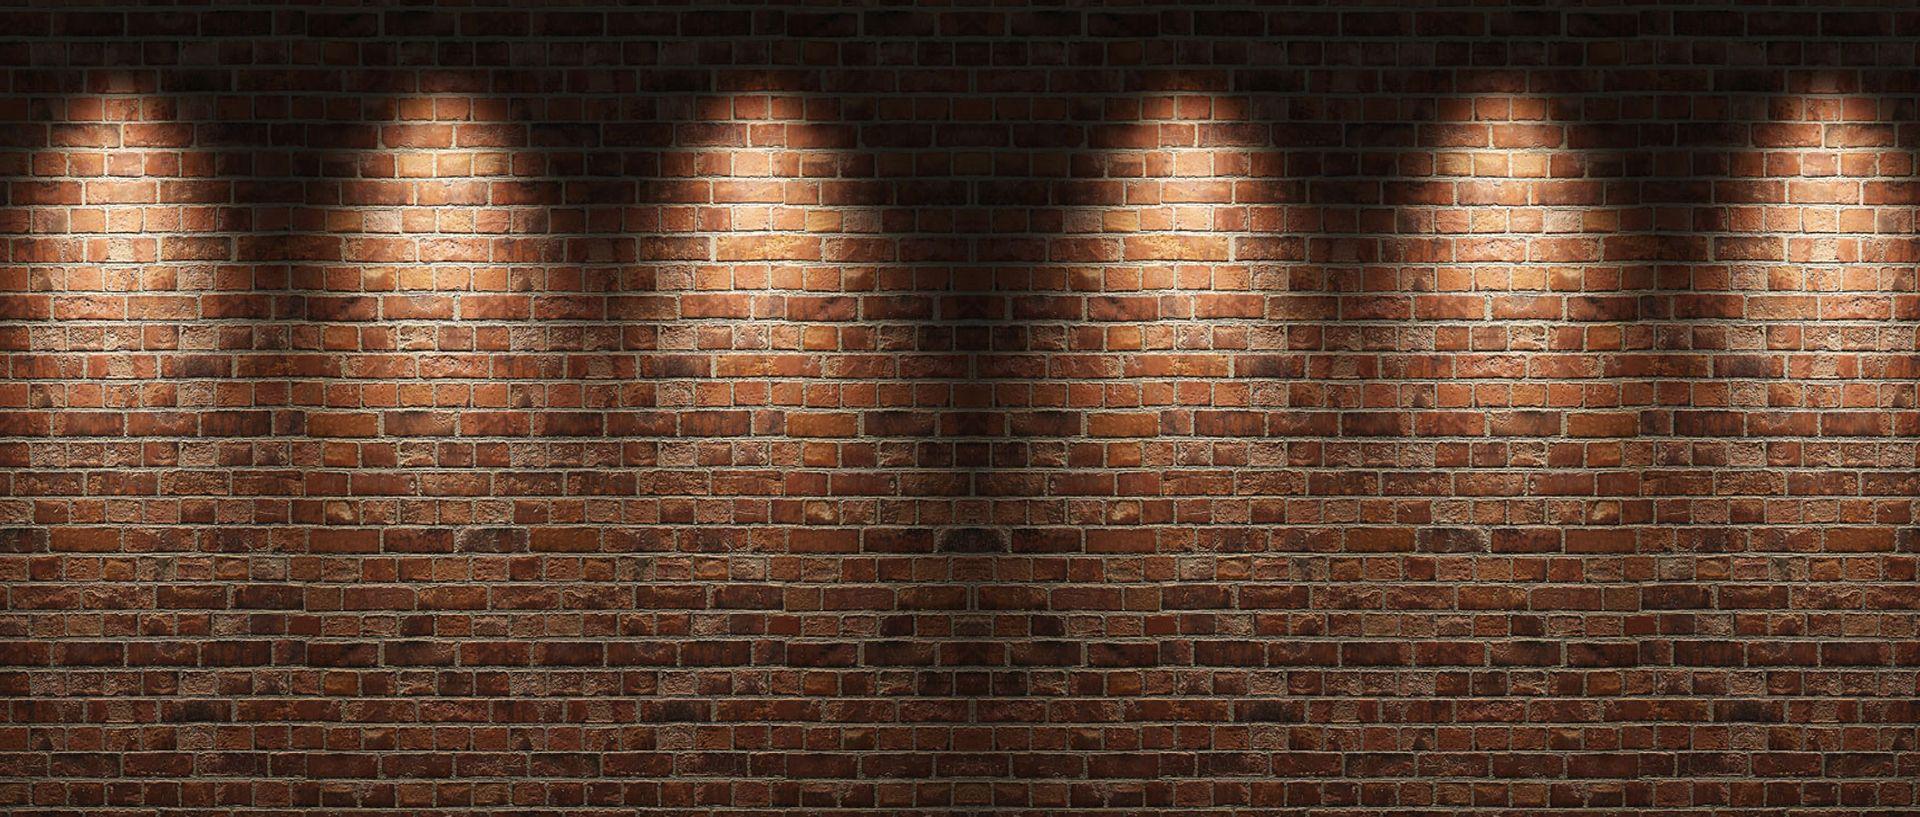 Simple Atmospheric Lighting Brick Taobao Poster Background Brick Wall Background Background Brick